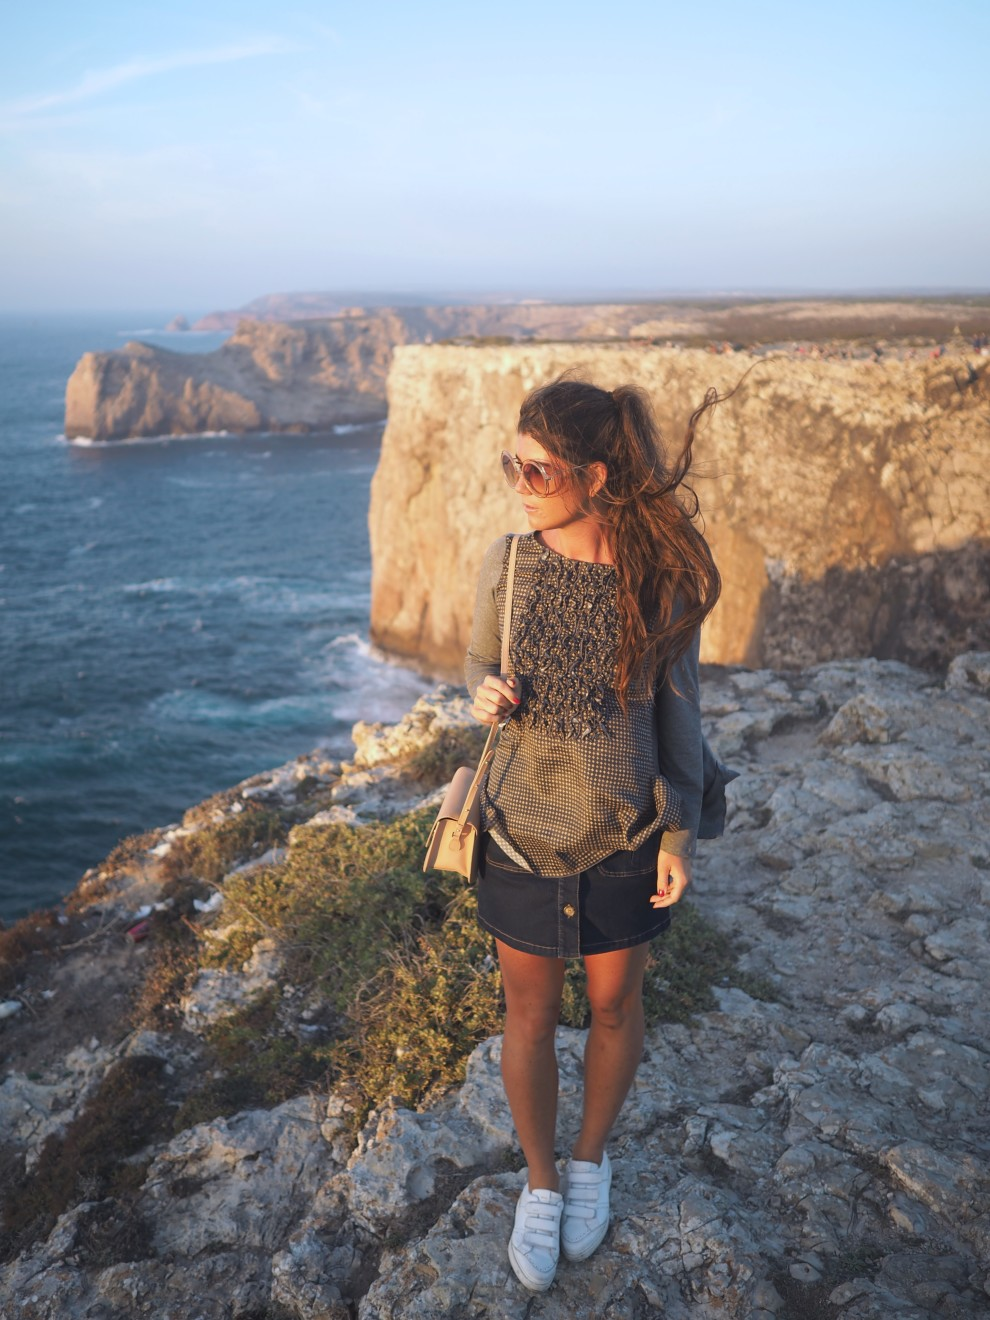 XACUS SHIRTS IN PORTUGAL